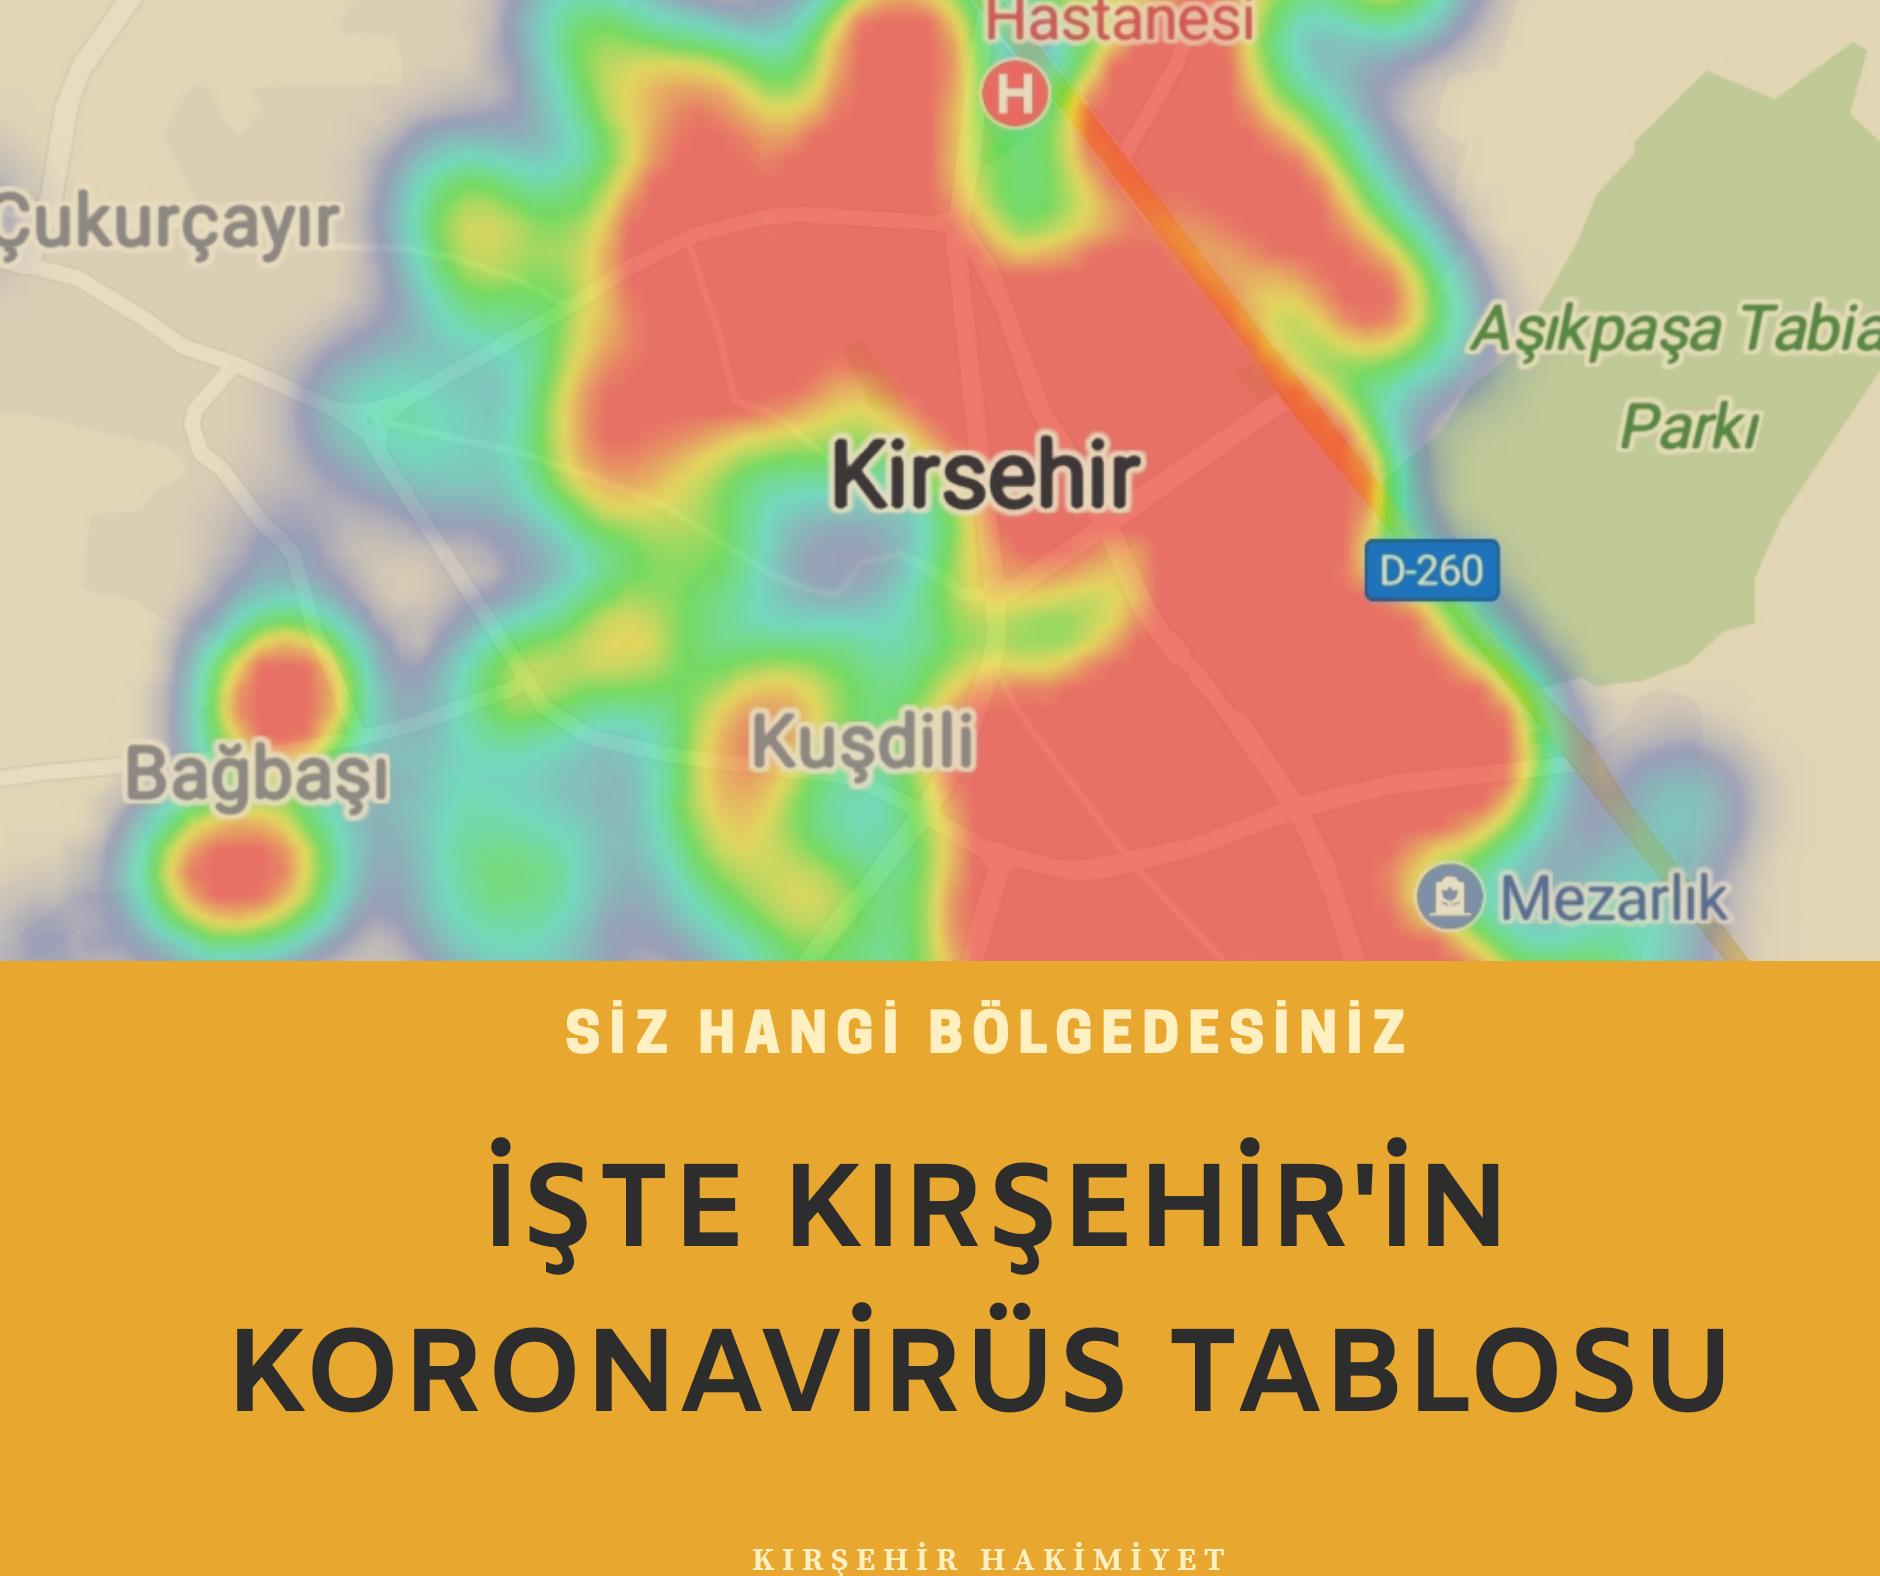 İşte Kırşehir'in son koranavirüs tablosu